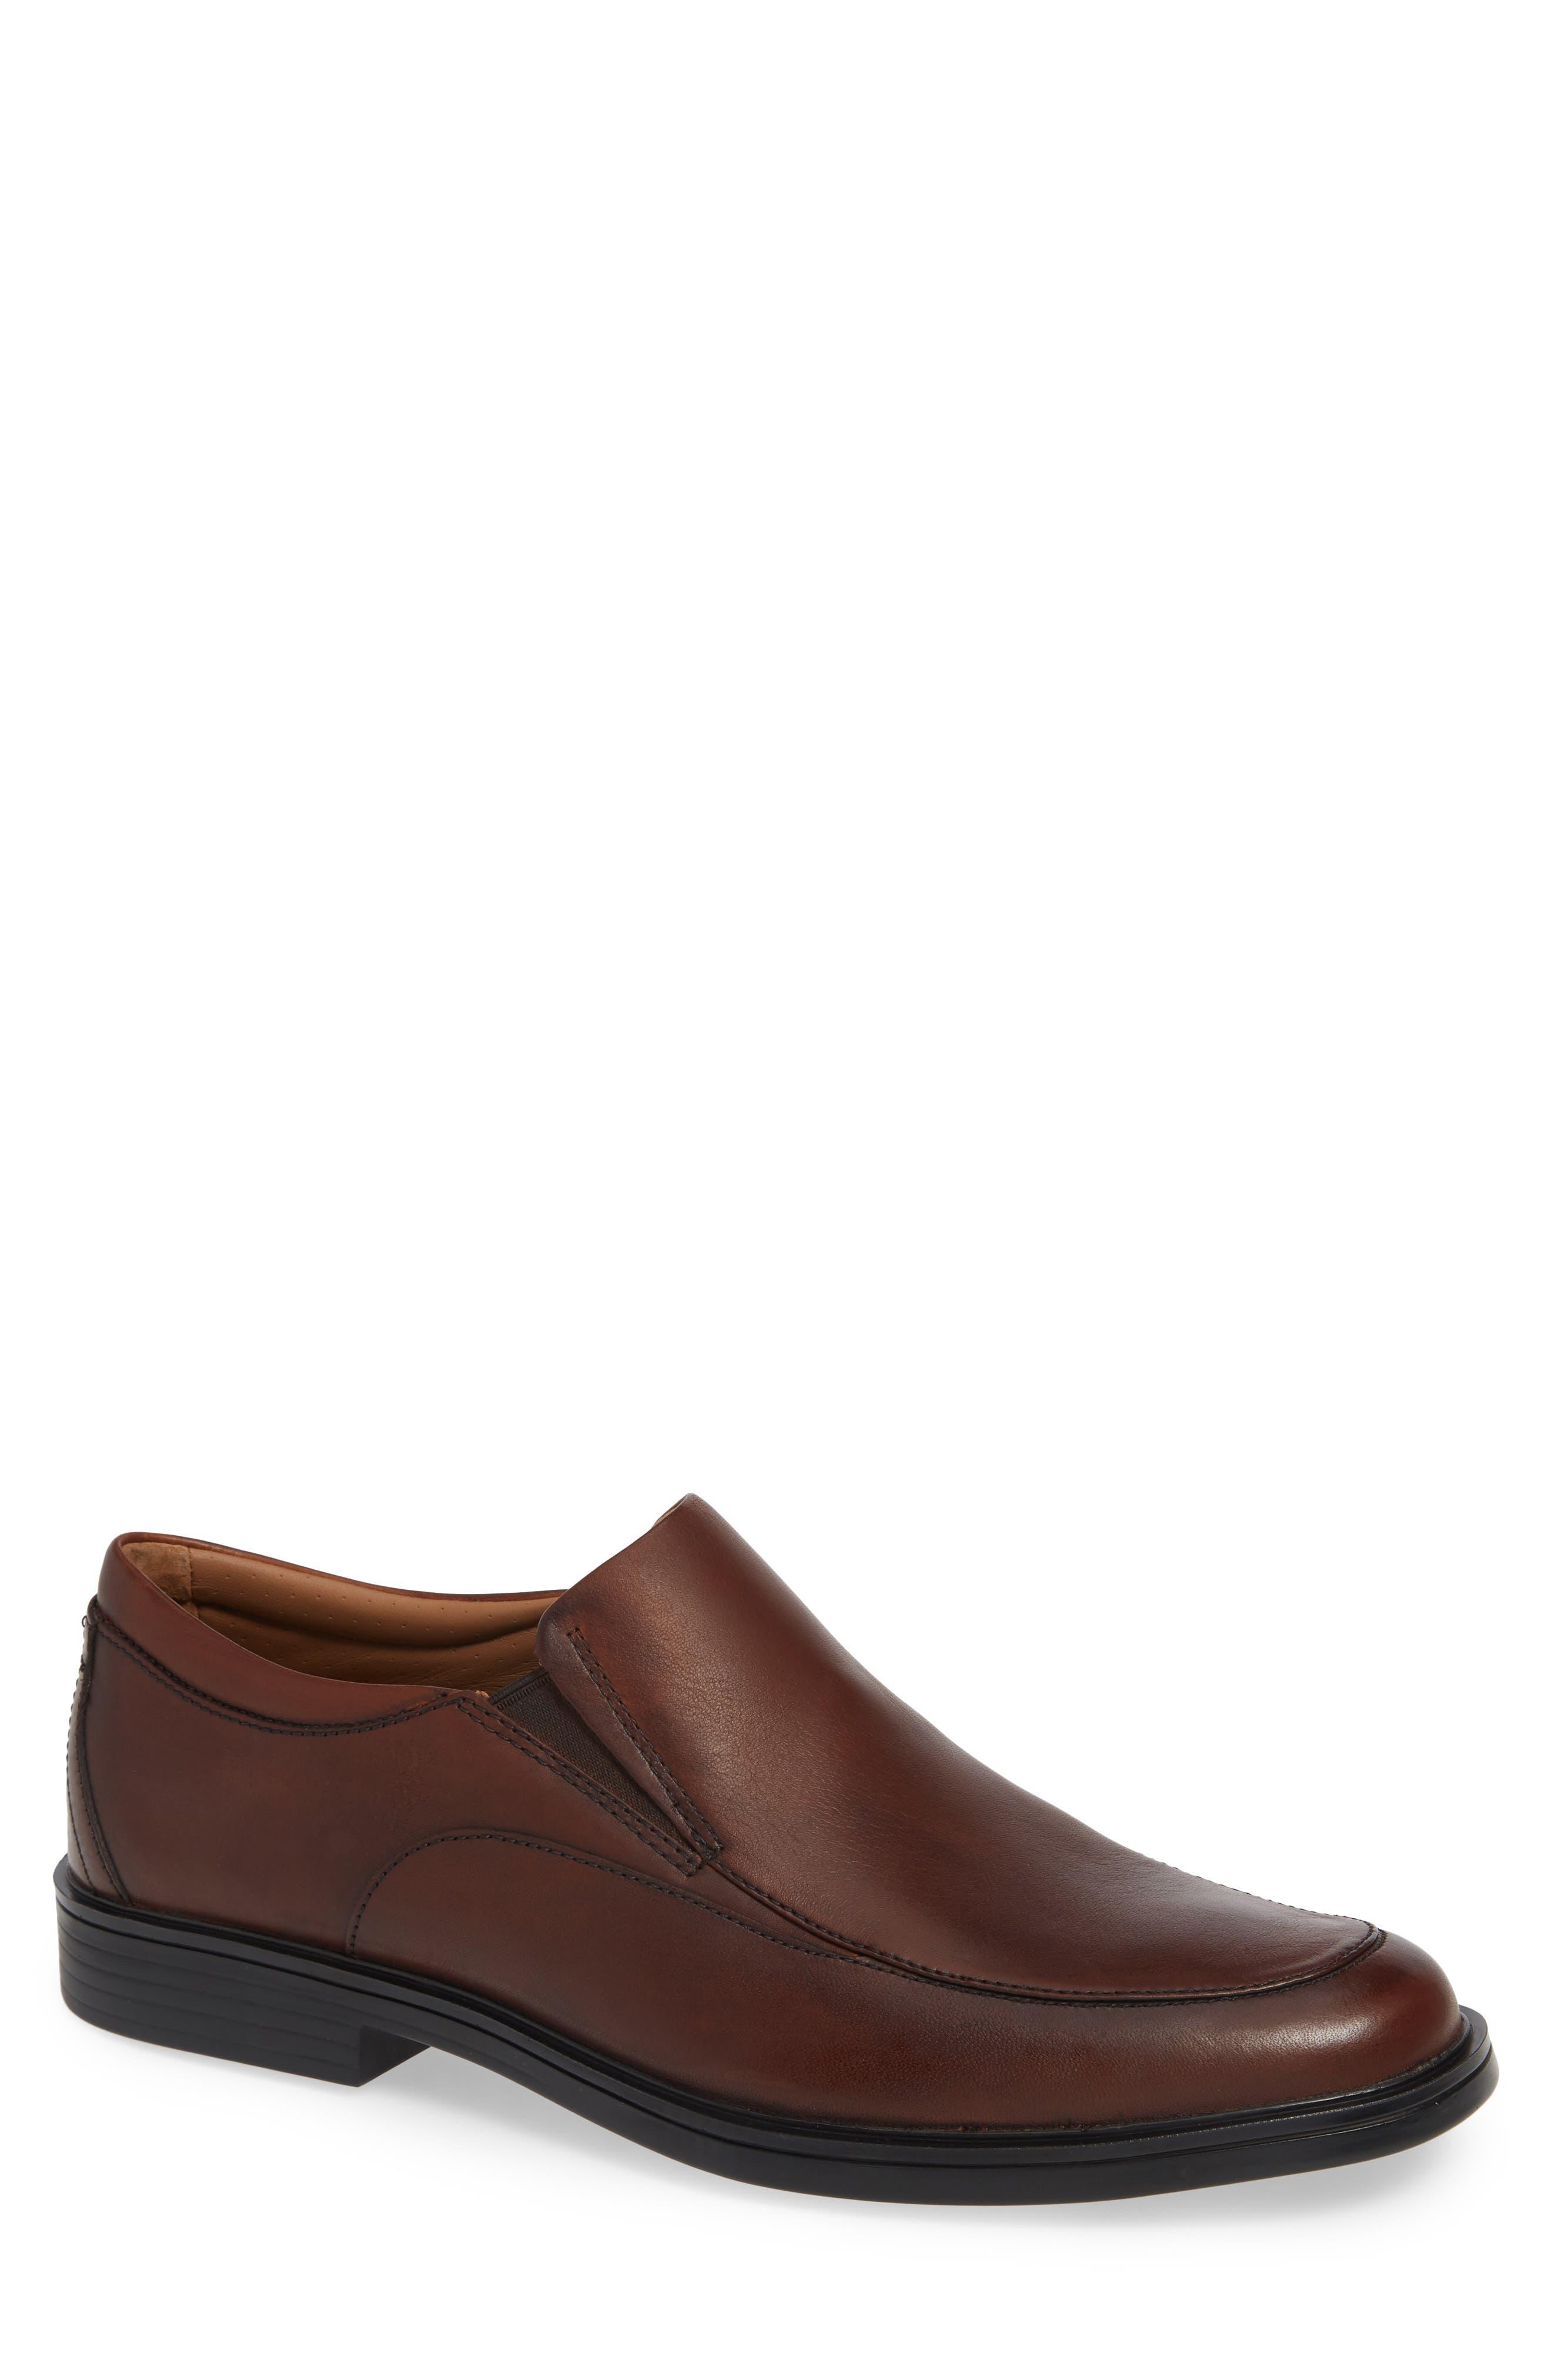 Originals Un Alderic Walk Loafer,                         Main,                         color, TAN LEATHER